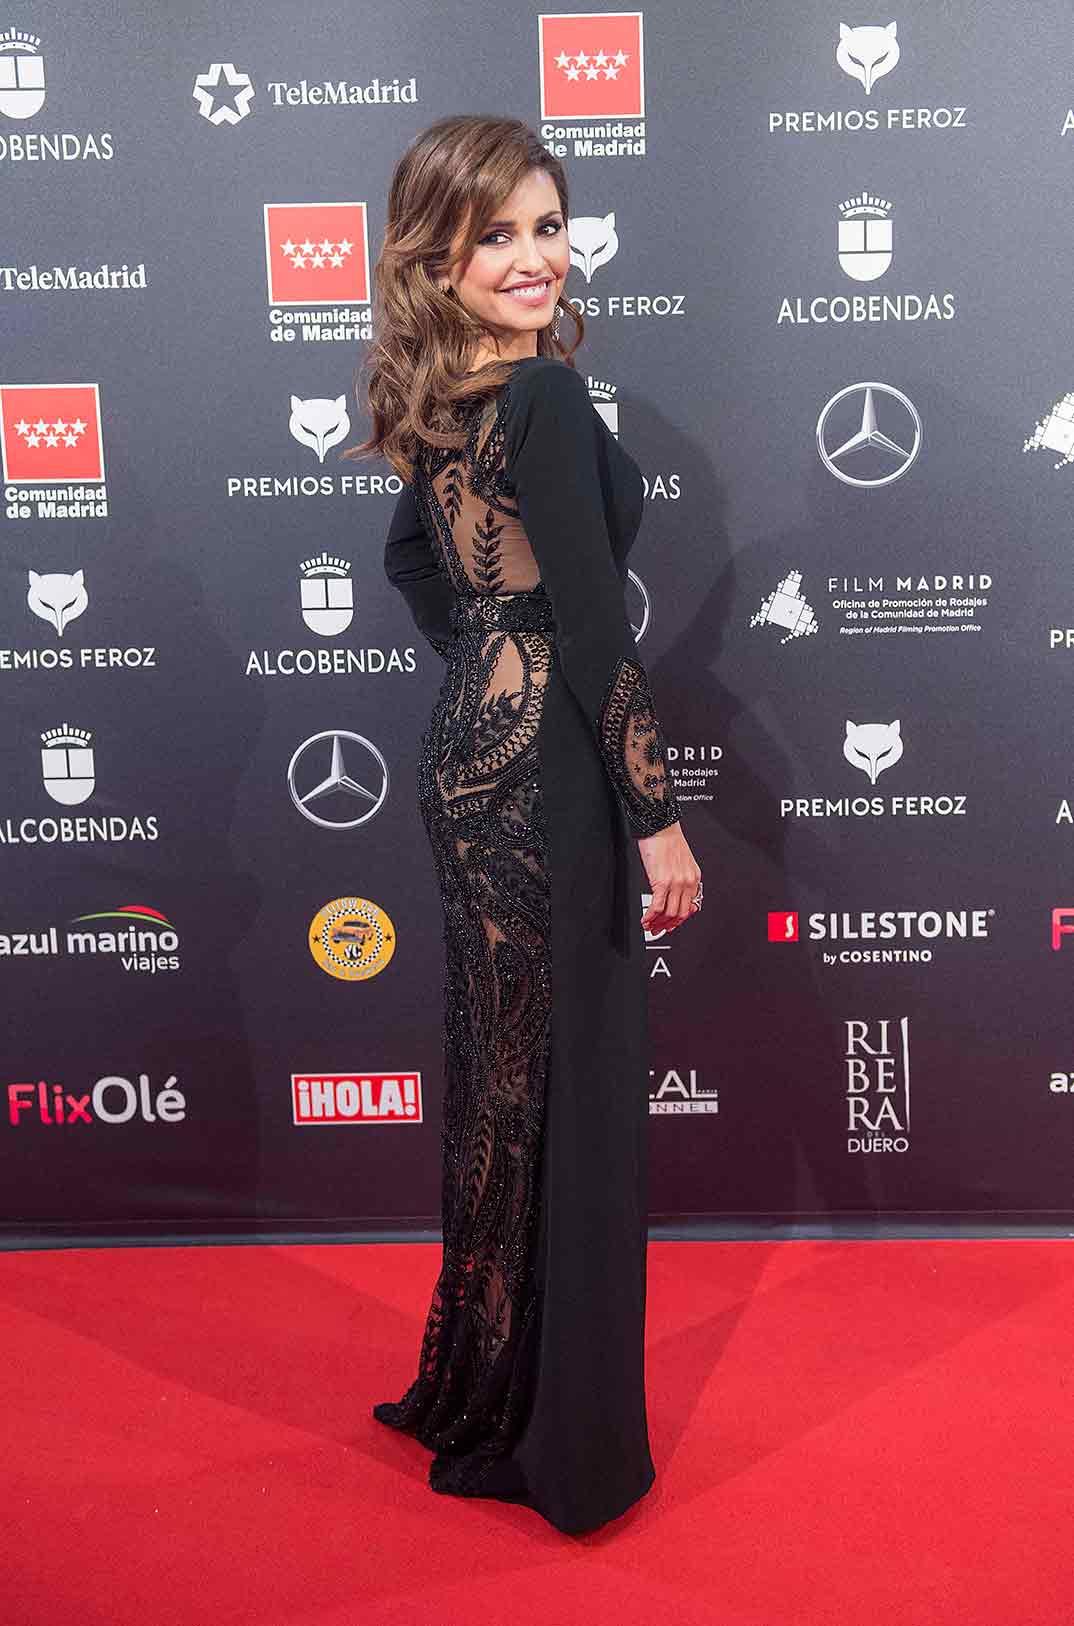 Mónica Cruz - Premios Feroz 2020